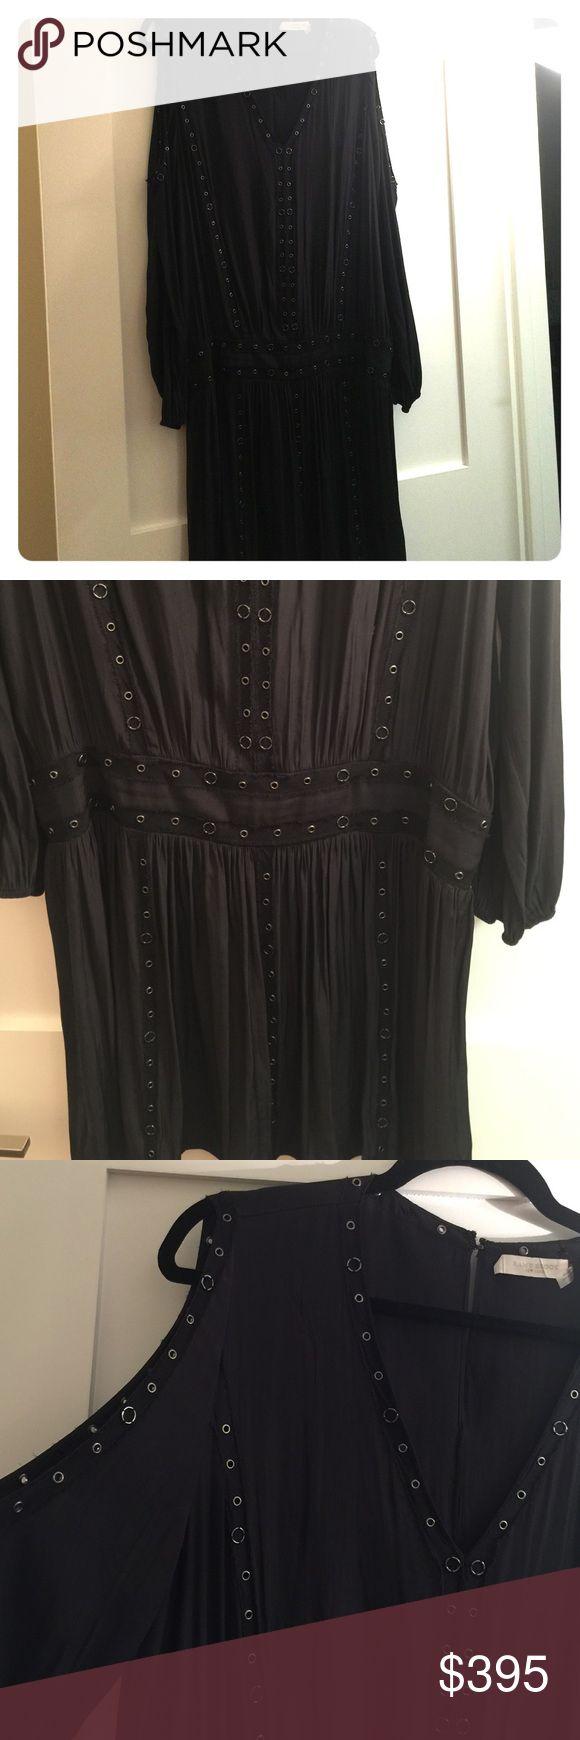 Ramy Brook sz L black dress Ramy Brook sz L black dress, cut out shoulders, v-neck, waistband, mini dress. Worn once, stunning Ramy Brook Dresses Midi